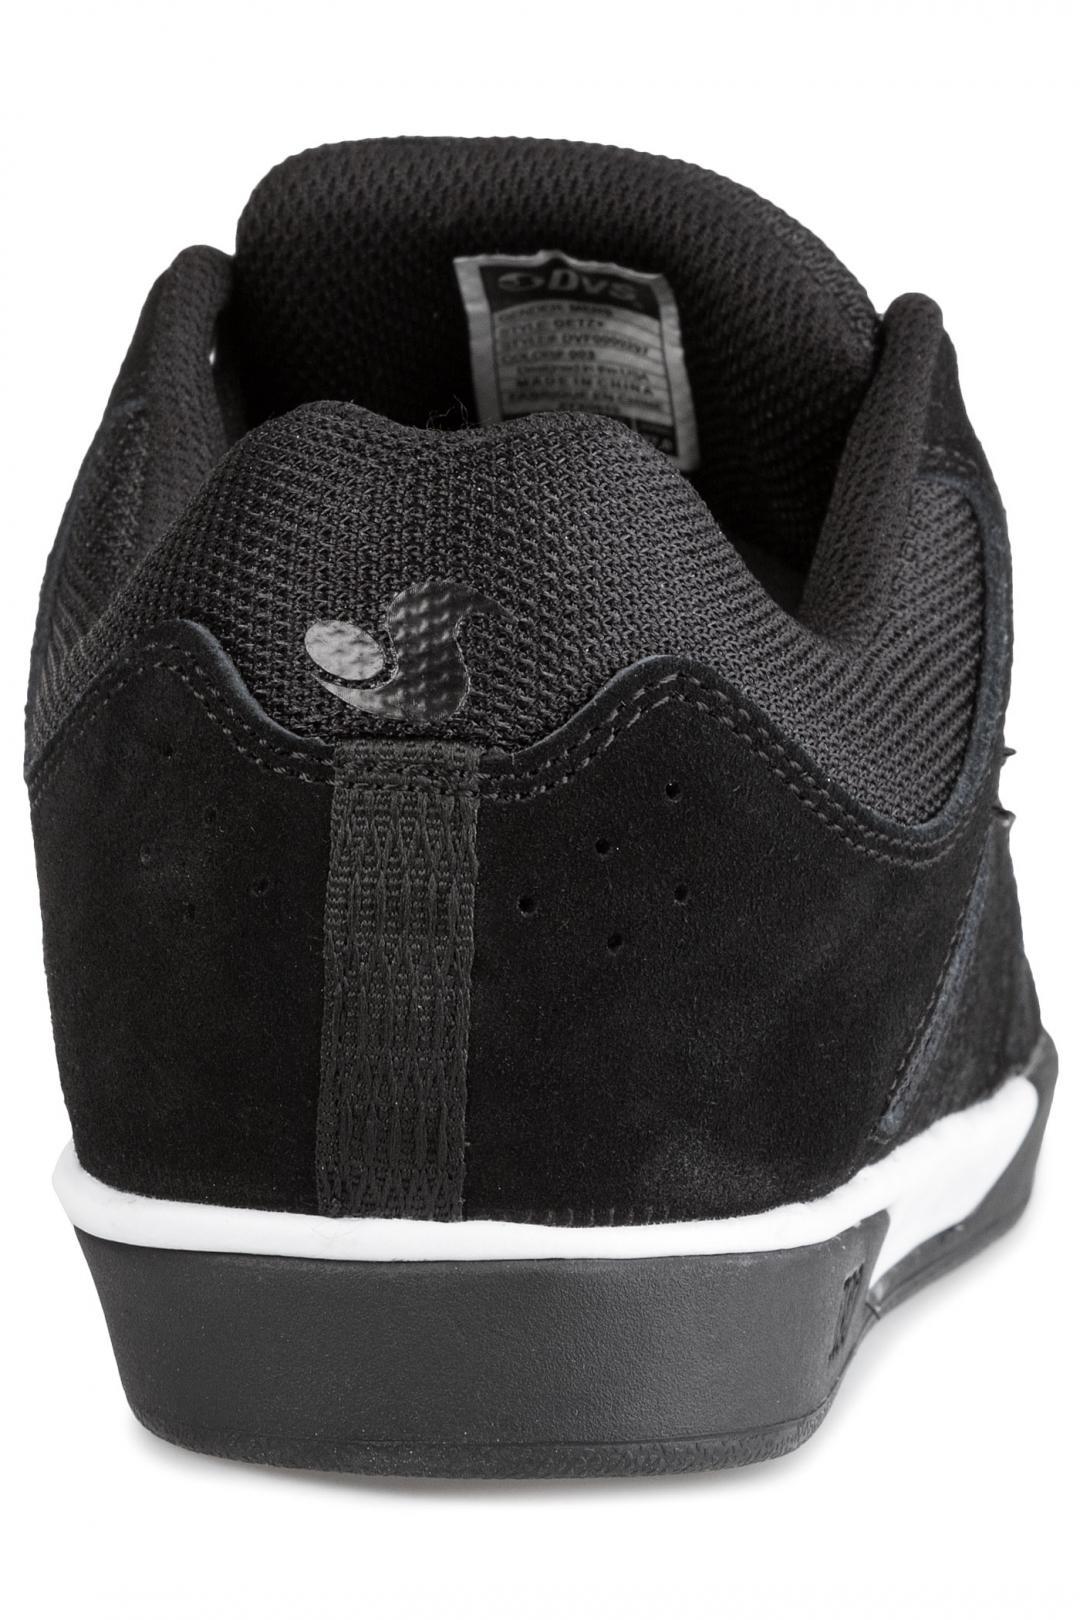 Uomo DVS Drift+ Suede black white black | Sneaker